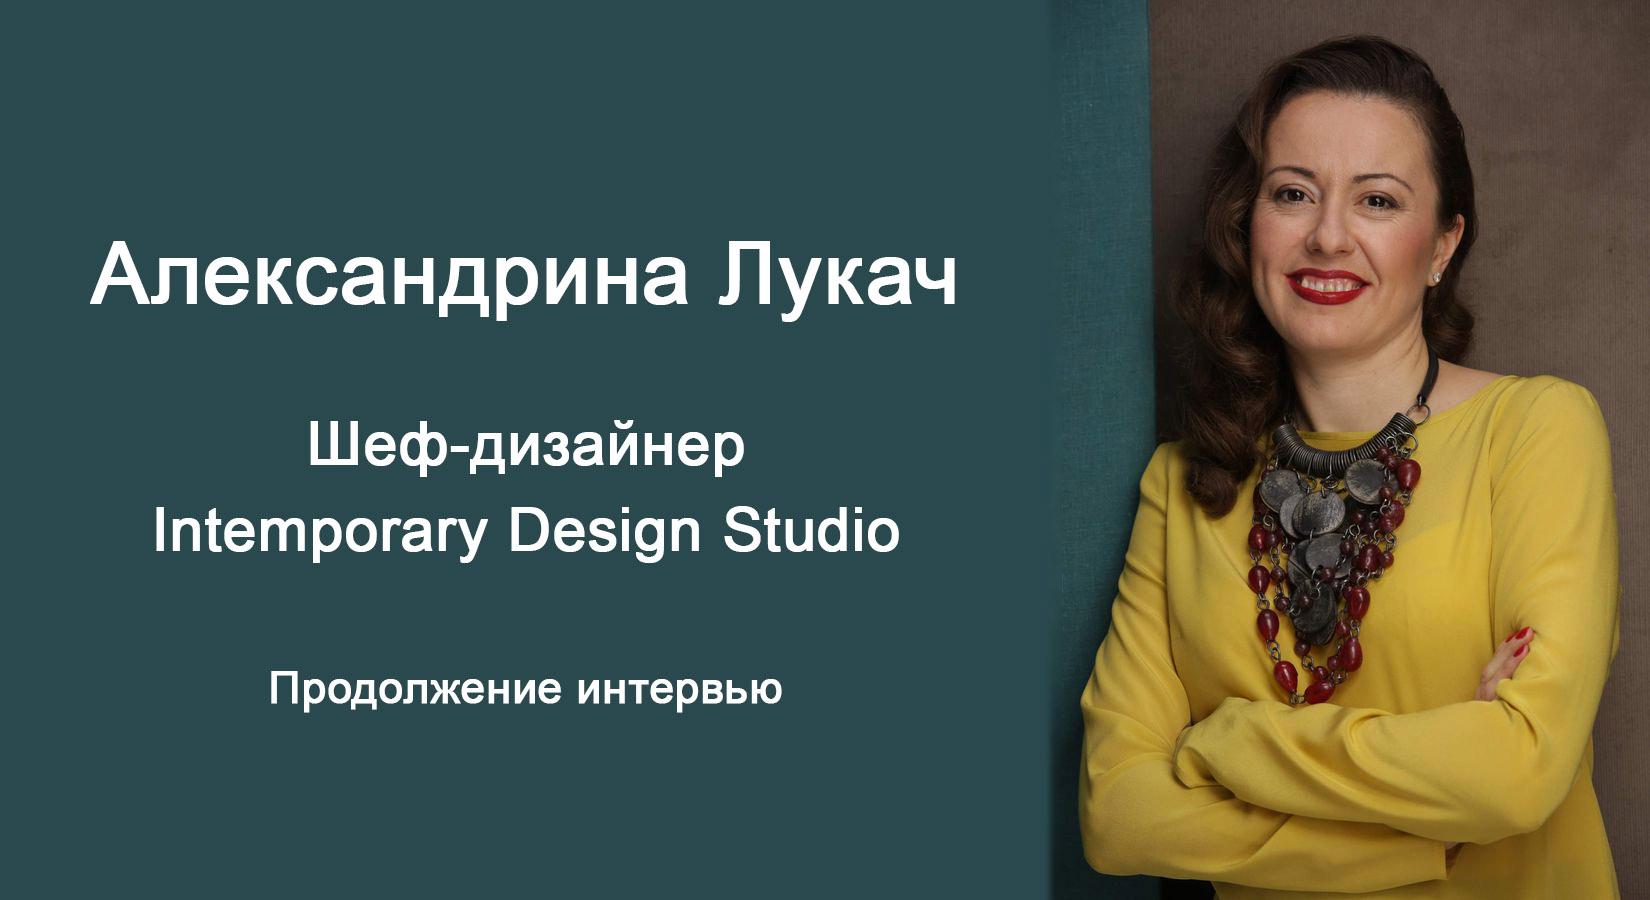 Інтерв'ю Александріни Лукач (Intemporary Design Studio) бренду DAVIS CASA. Частина 2